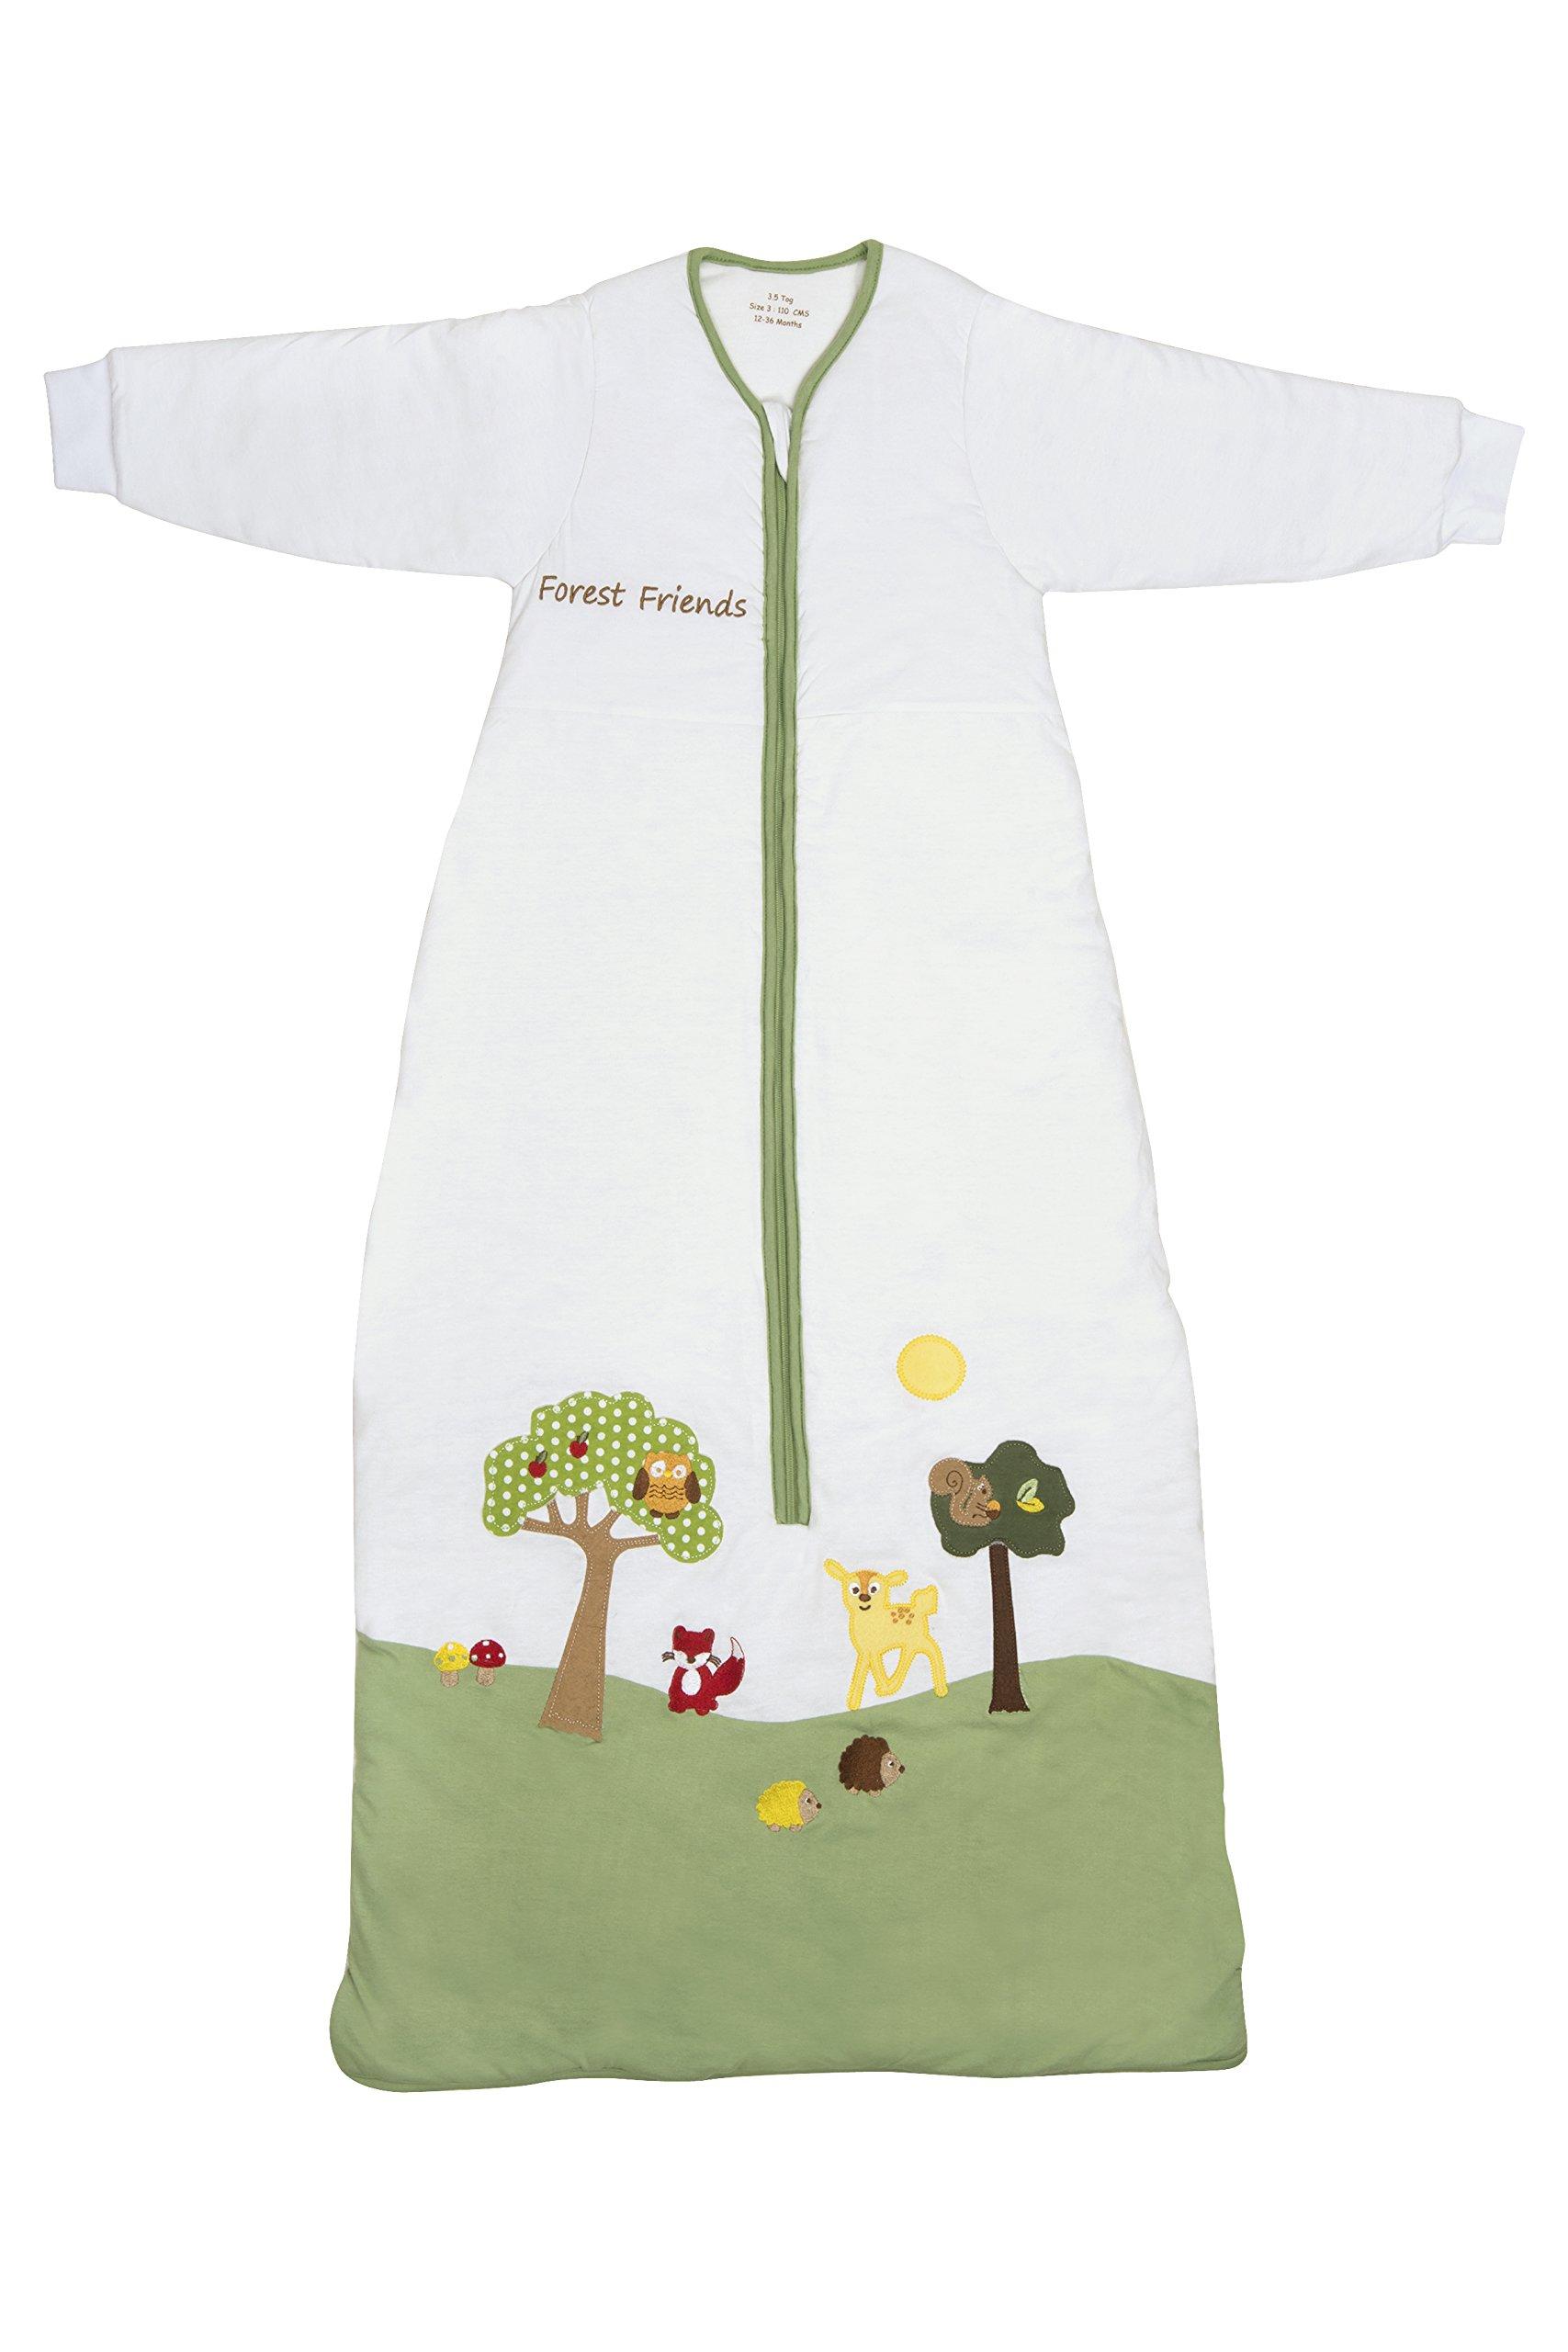 Slumbersafe Winter Toddler Sleeping Bag Long Sleeves 3.5 Tog - Forest Friends, 18-36 Months/Large by Slumbersafe